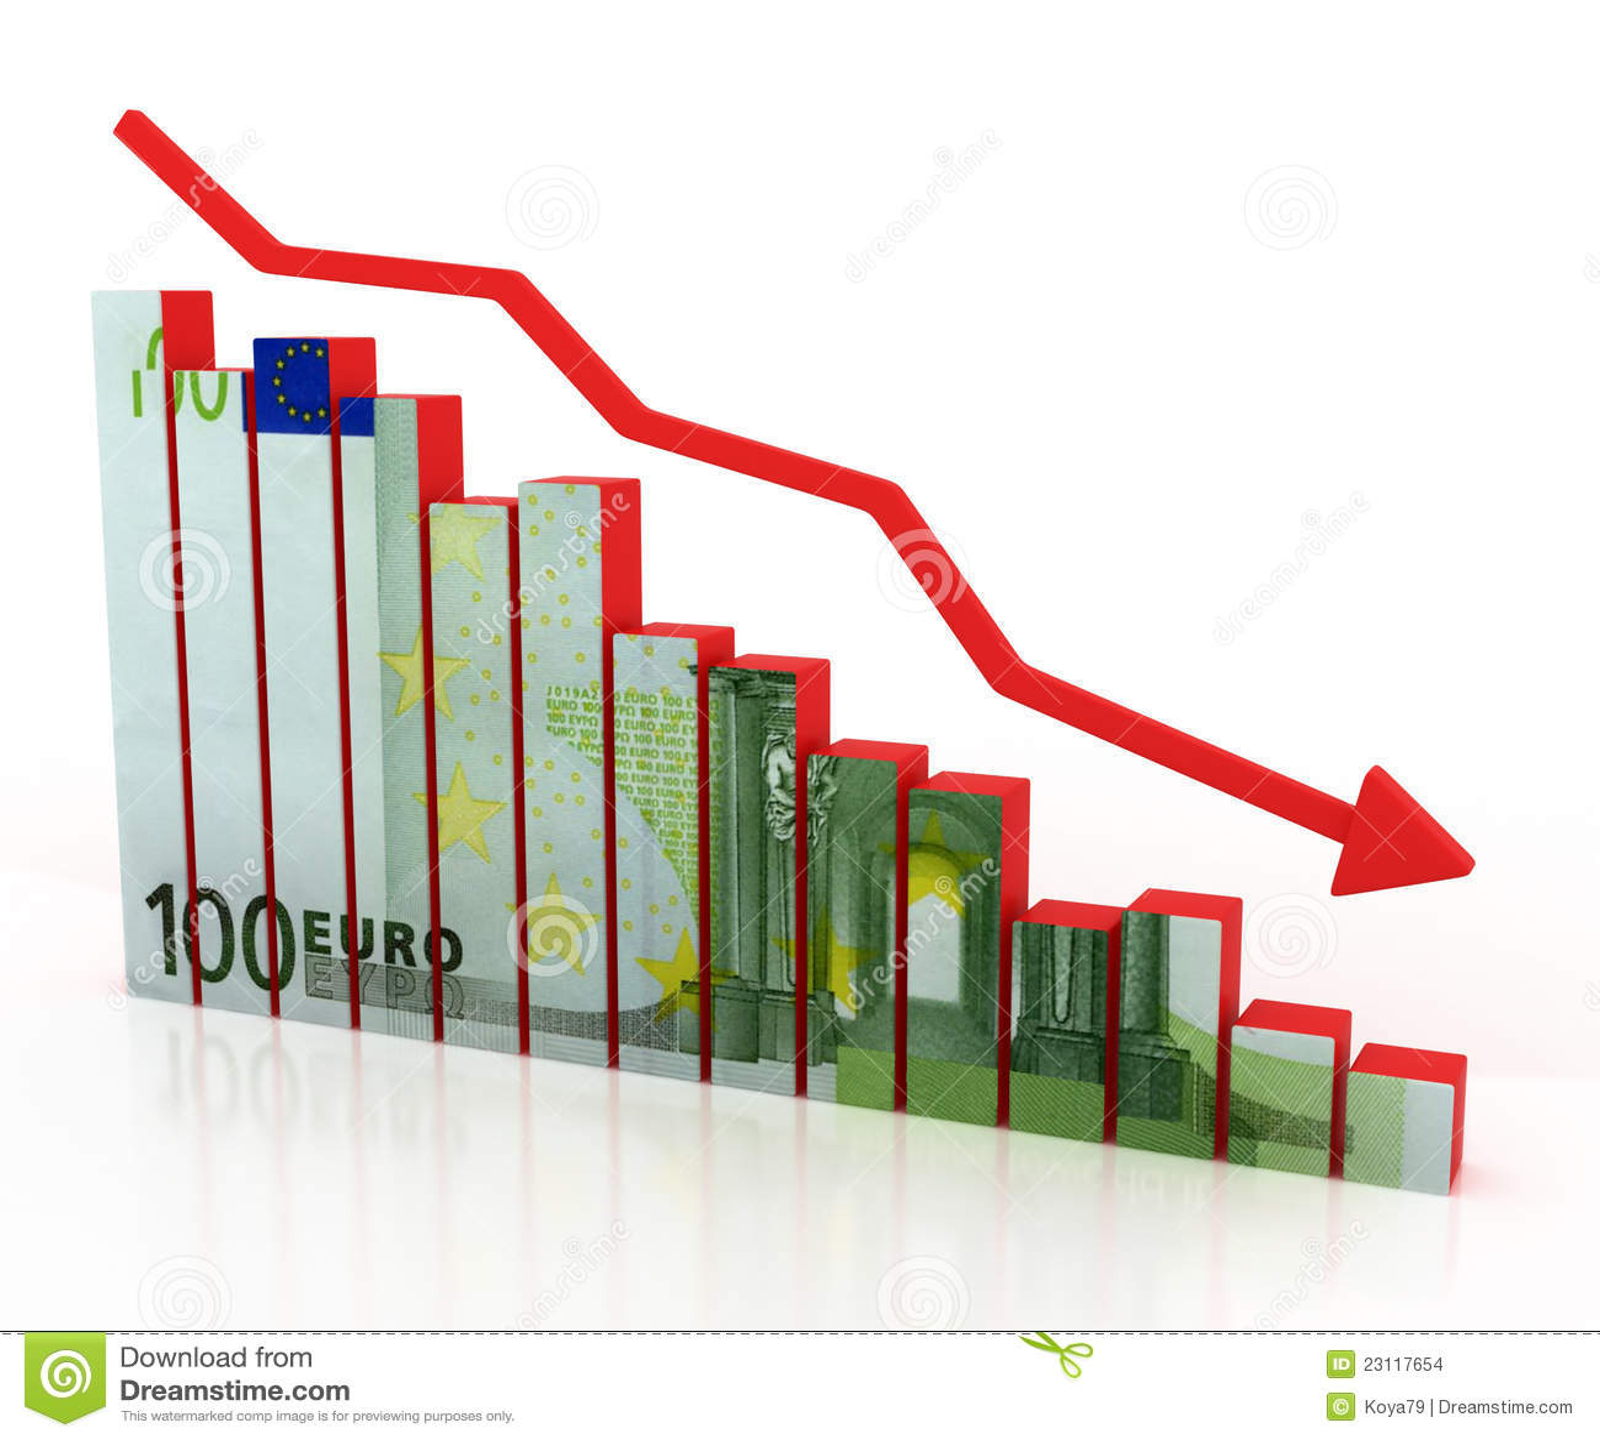 harvard thesis financial crisis